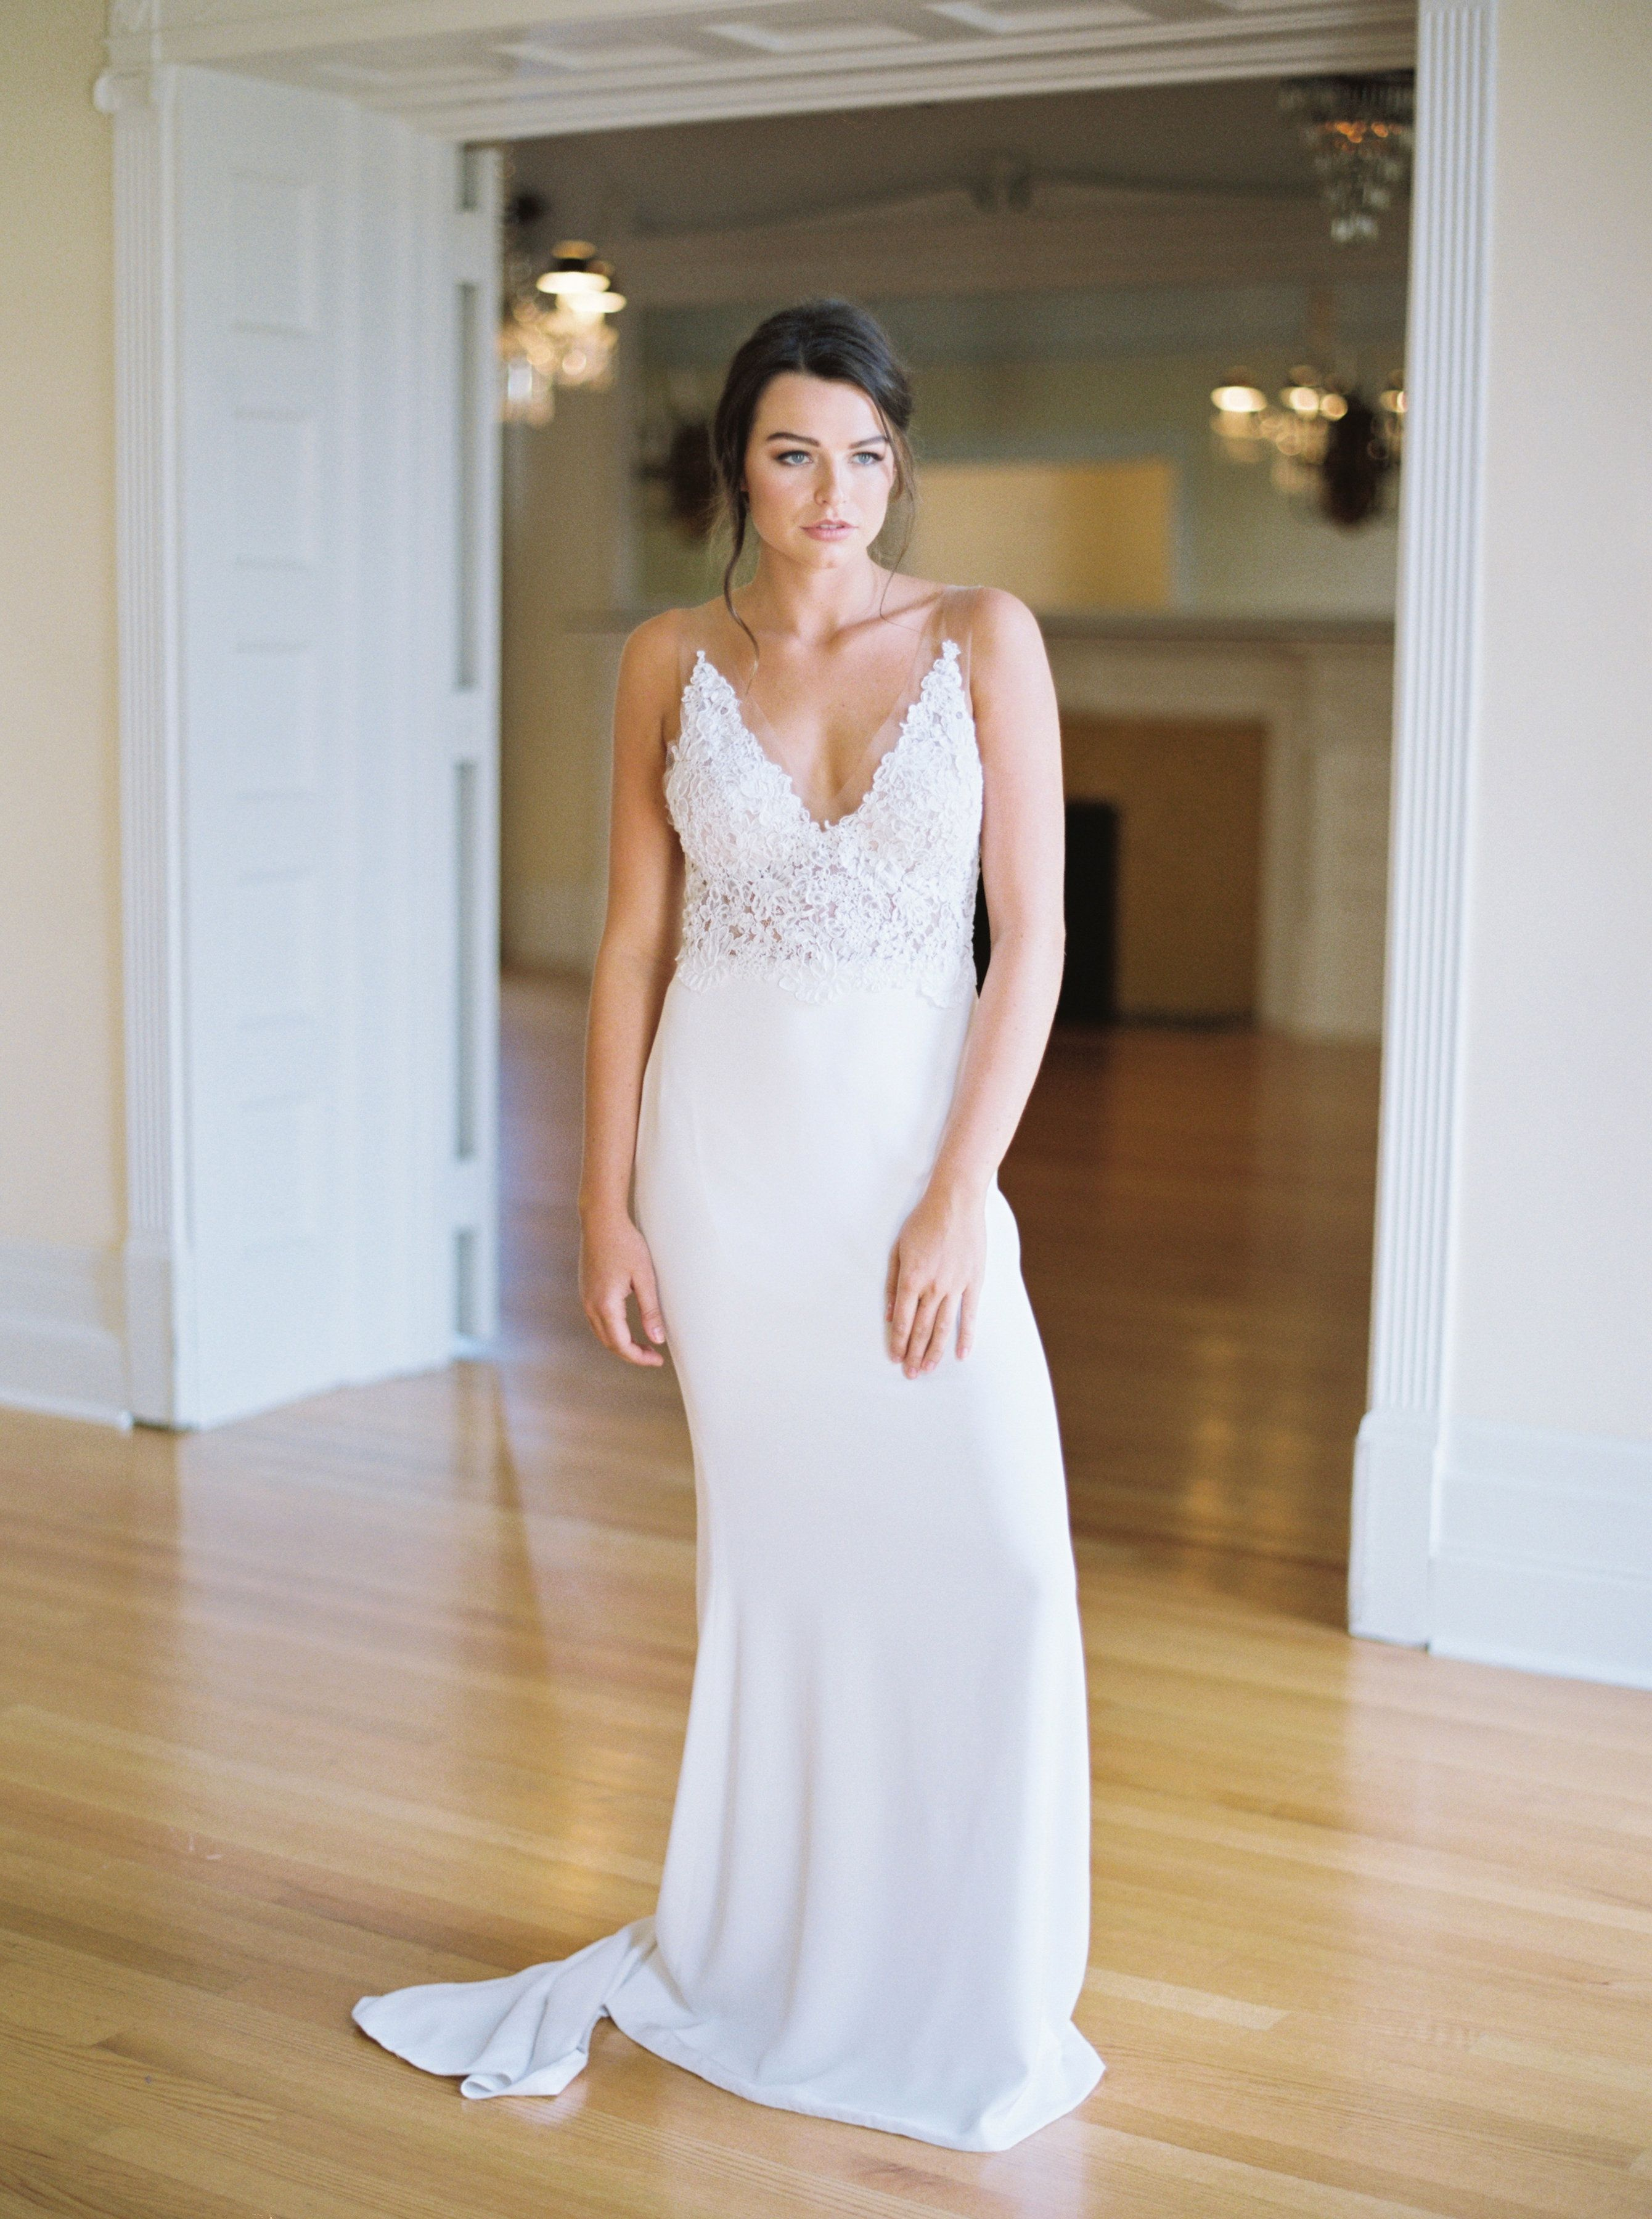 Alyssa Kristin wedding gown | Lace wedding dress with illusion ...